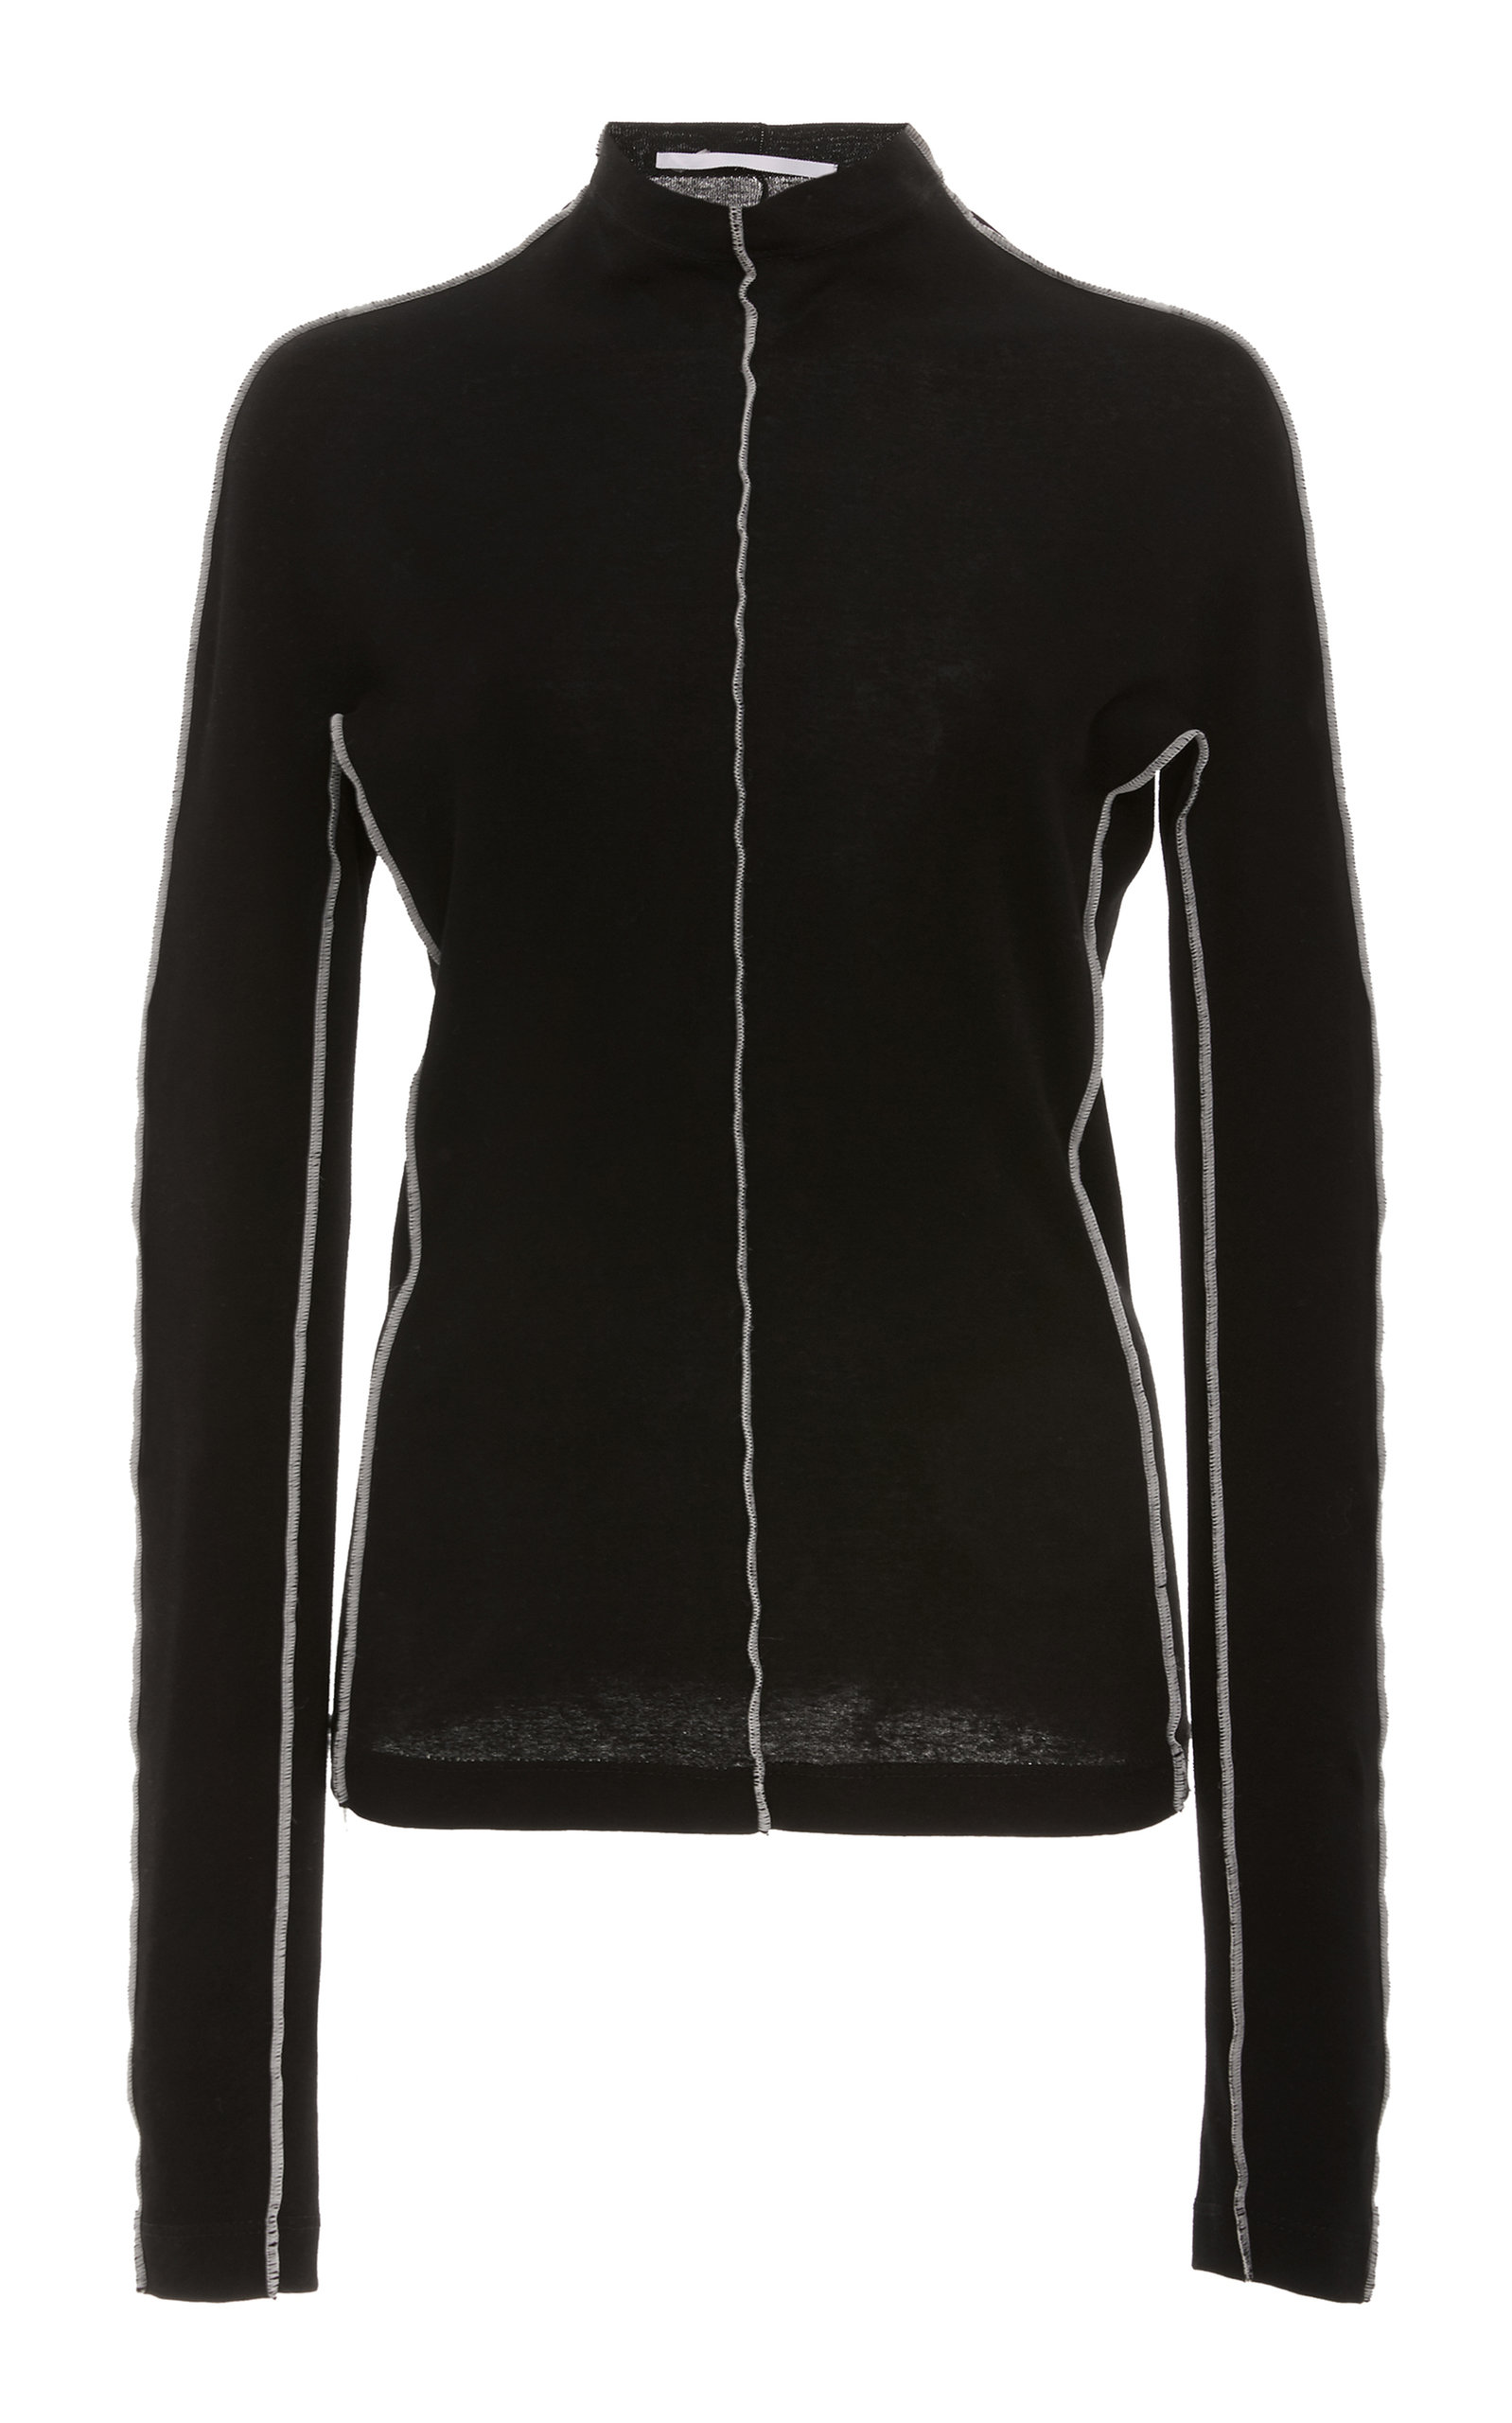 ROSETTA GETTY Mock-Neck Long-Sleeve Reverse-Seam Cotton Jersey Top in Black